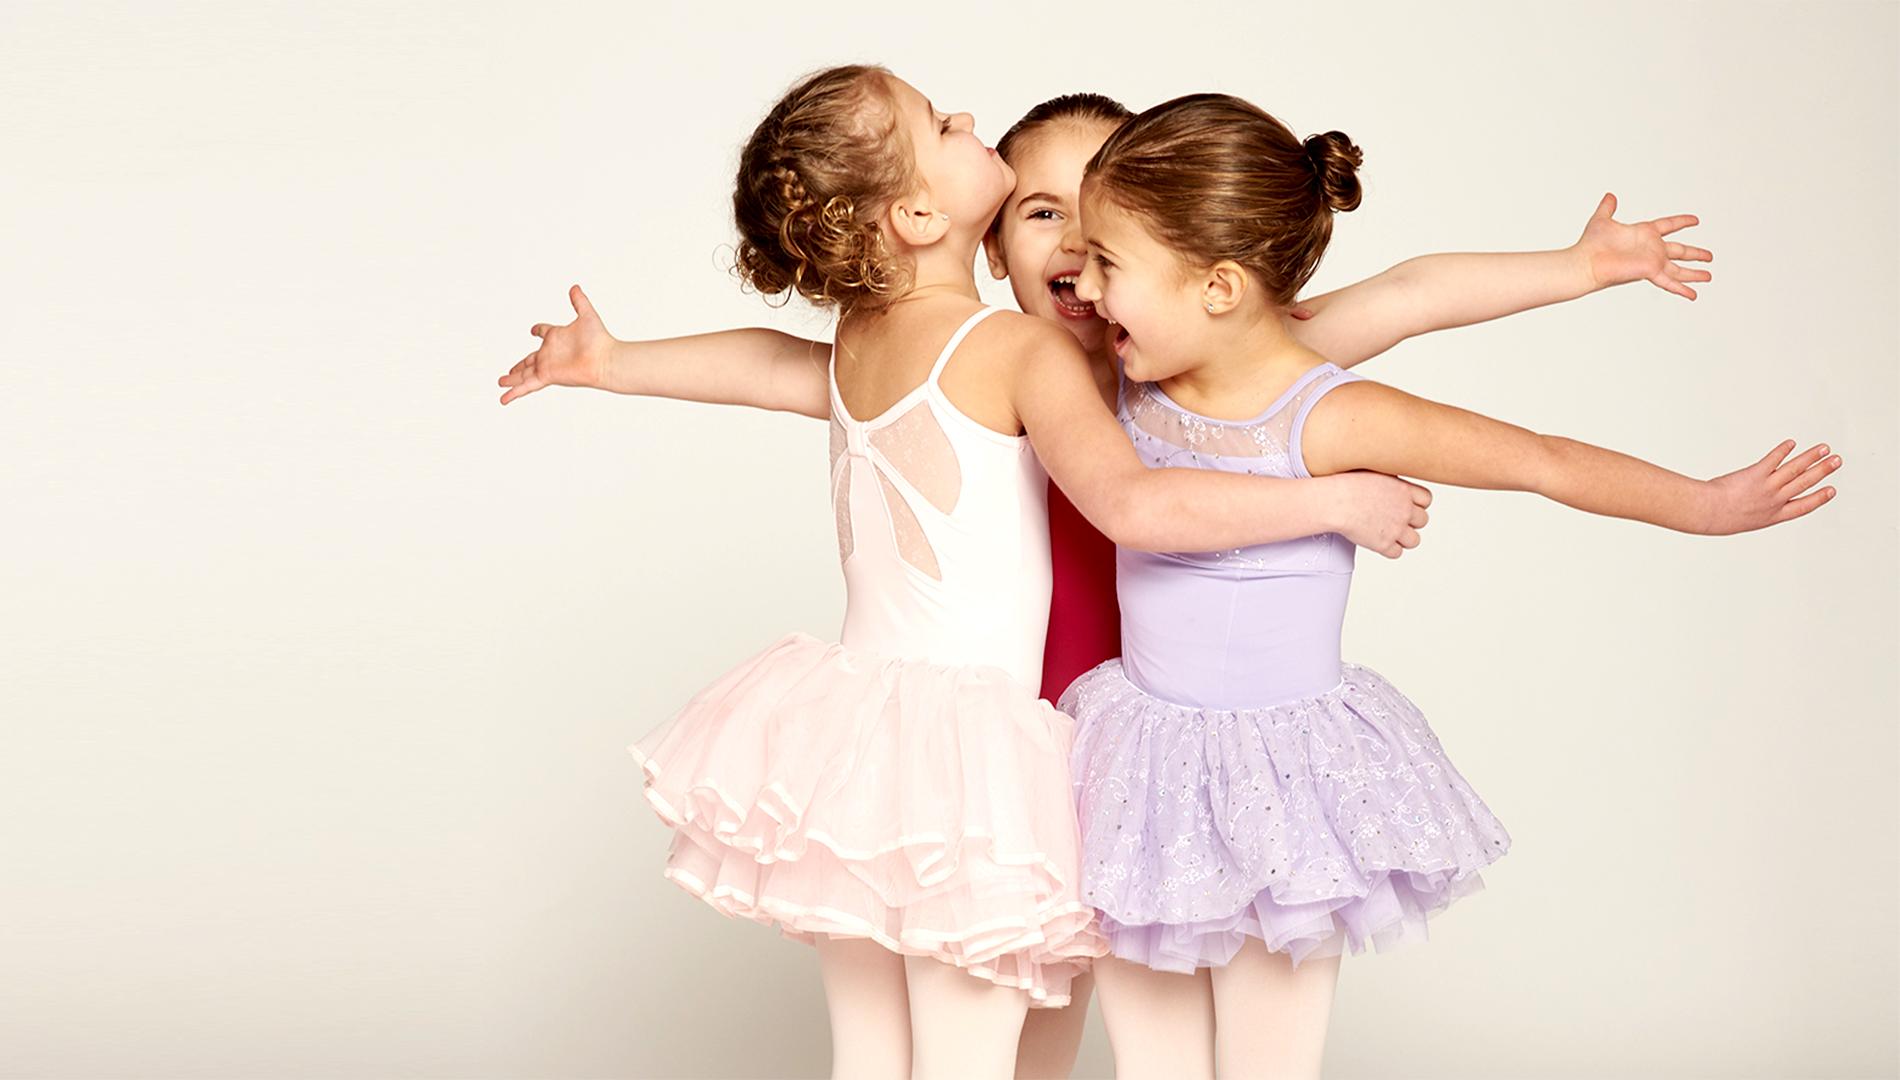 preschool, dance, lessons, friends, ballet